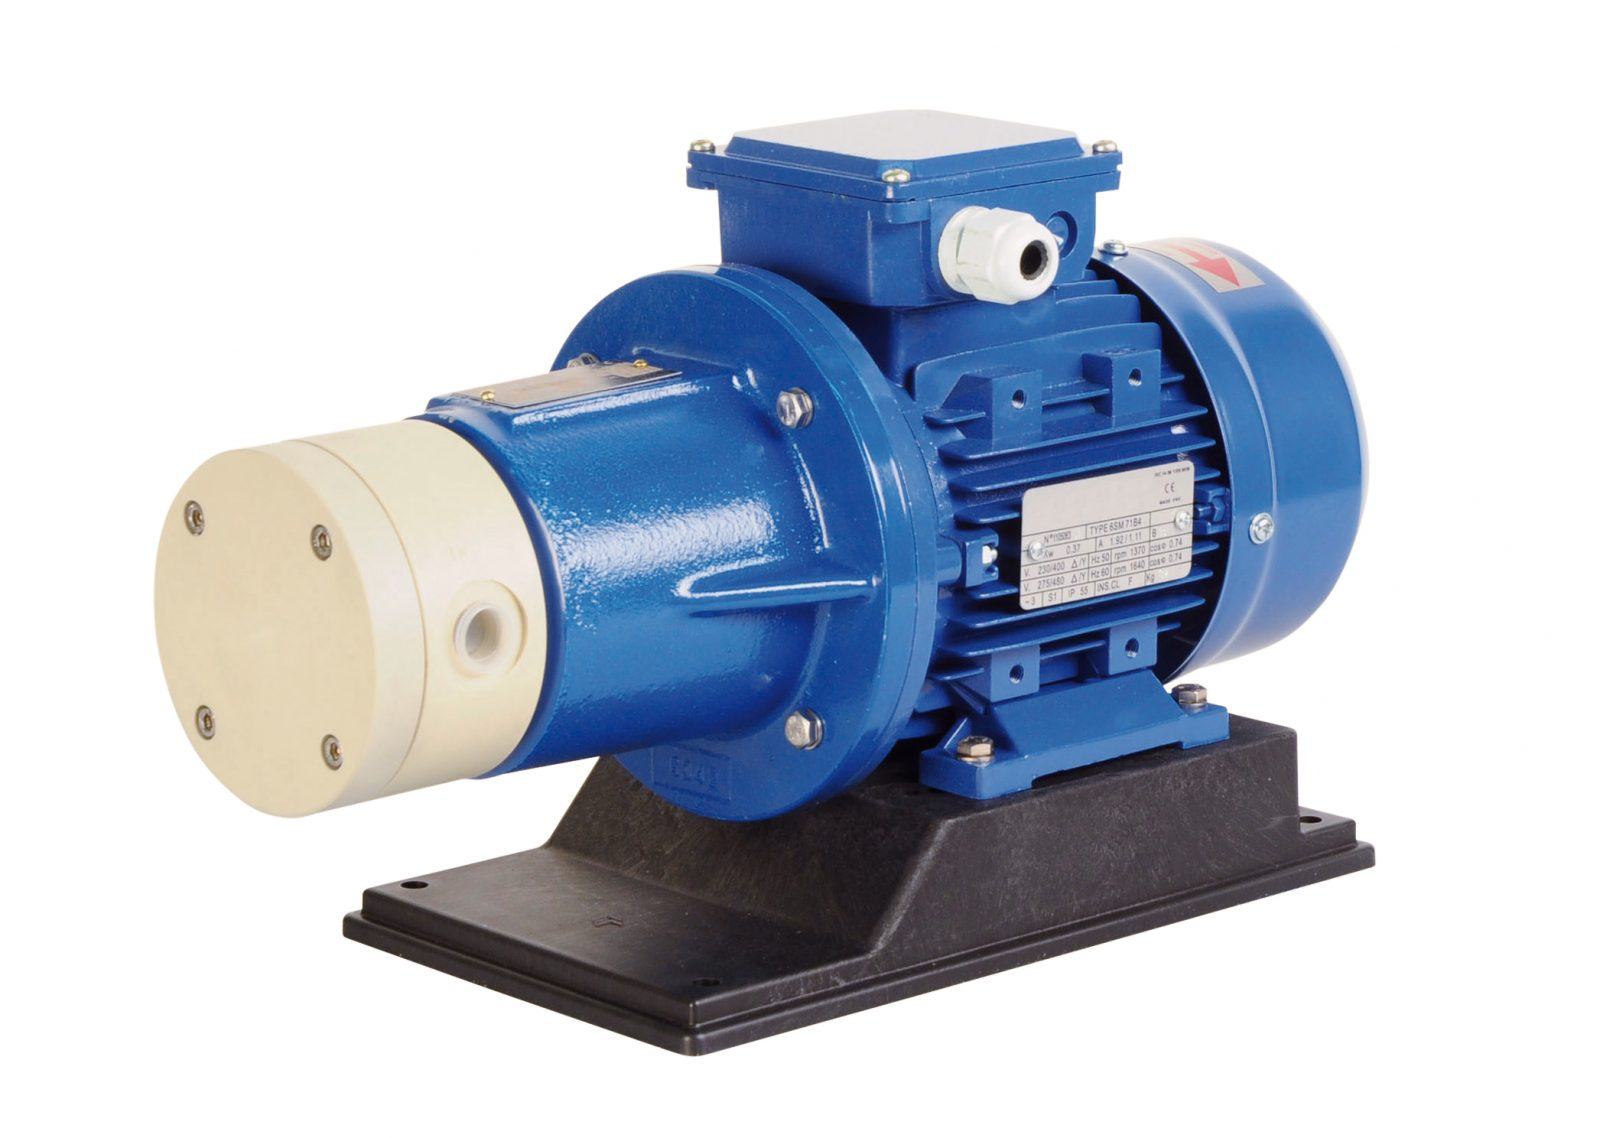 VMP - Magnetically Driven Vane Pump